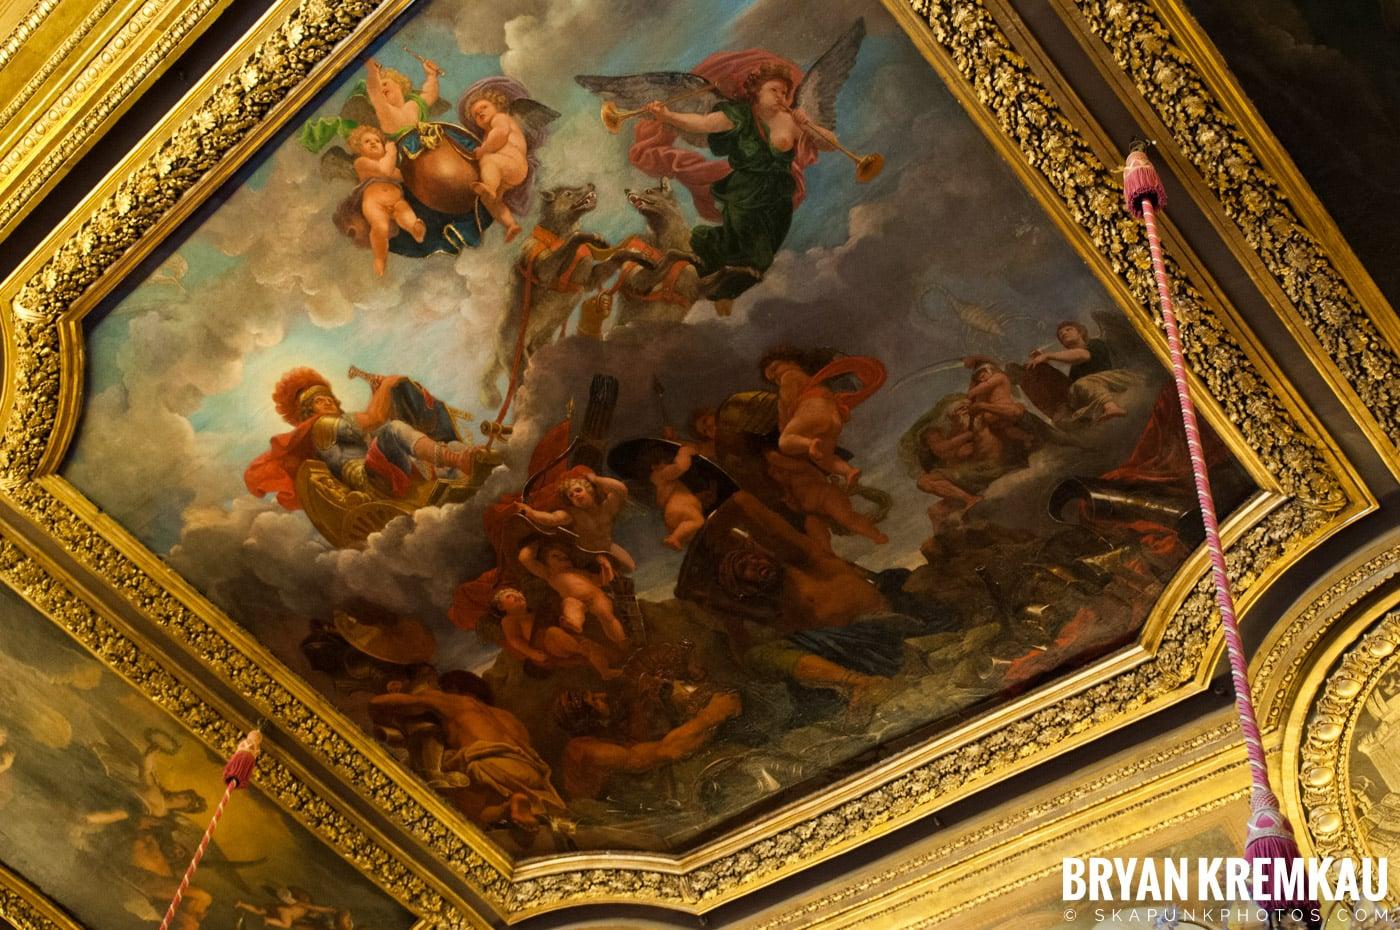 Paris, France Honeymoon - Day 2 - 7.19.11 (39)